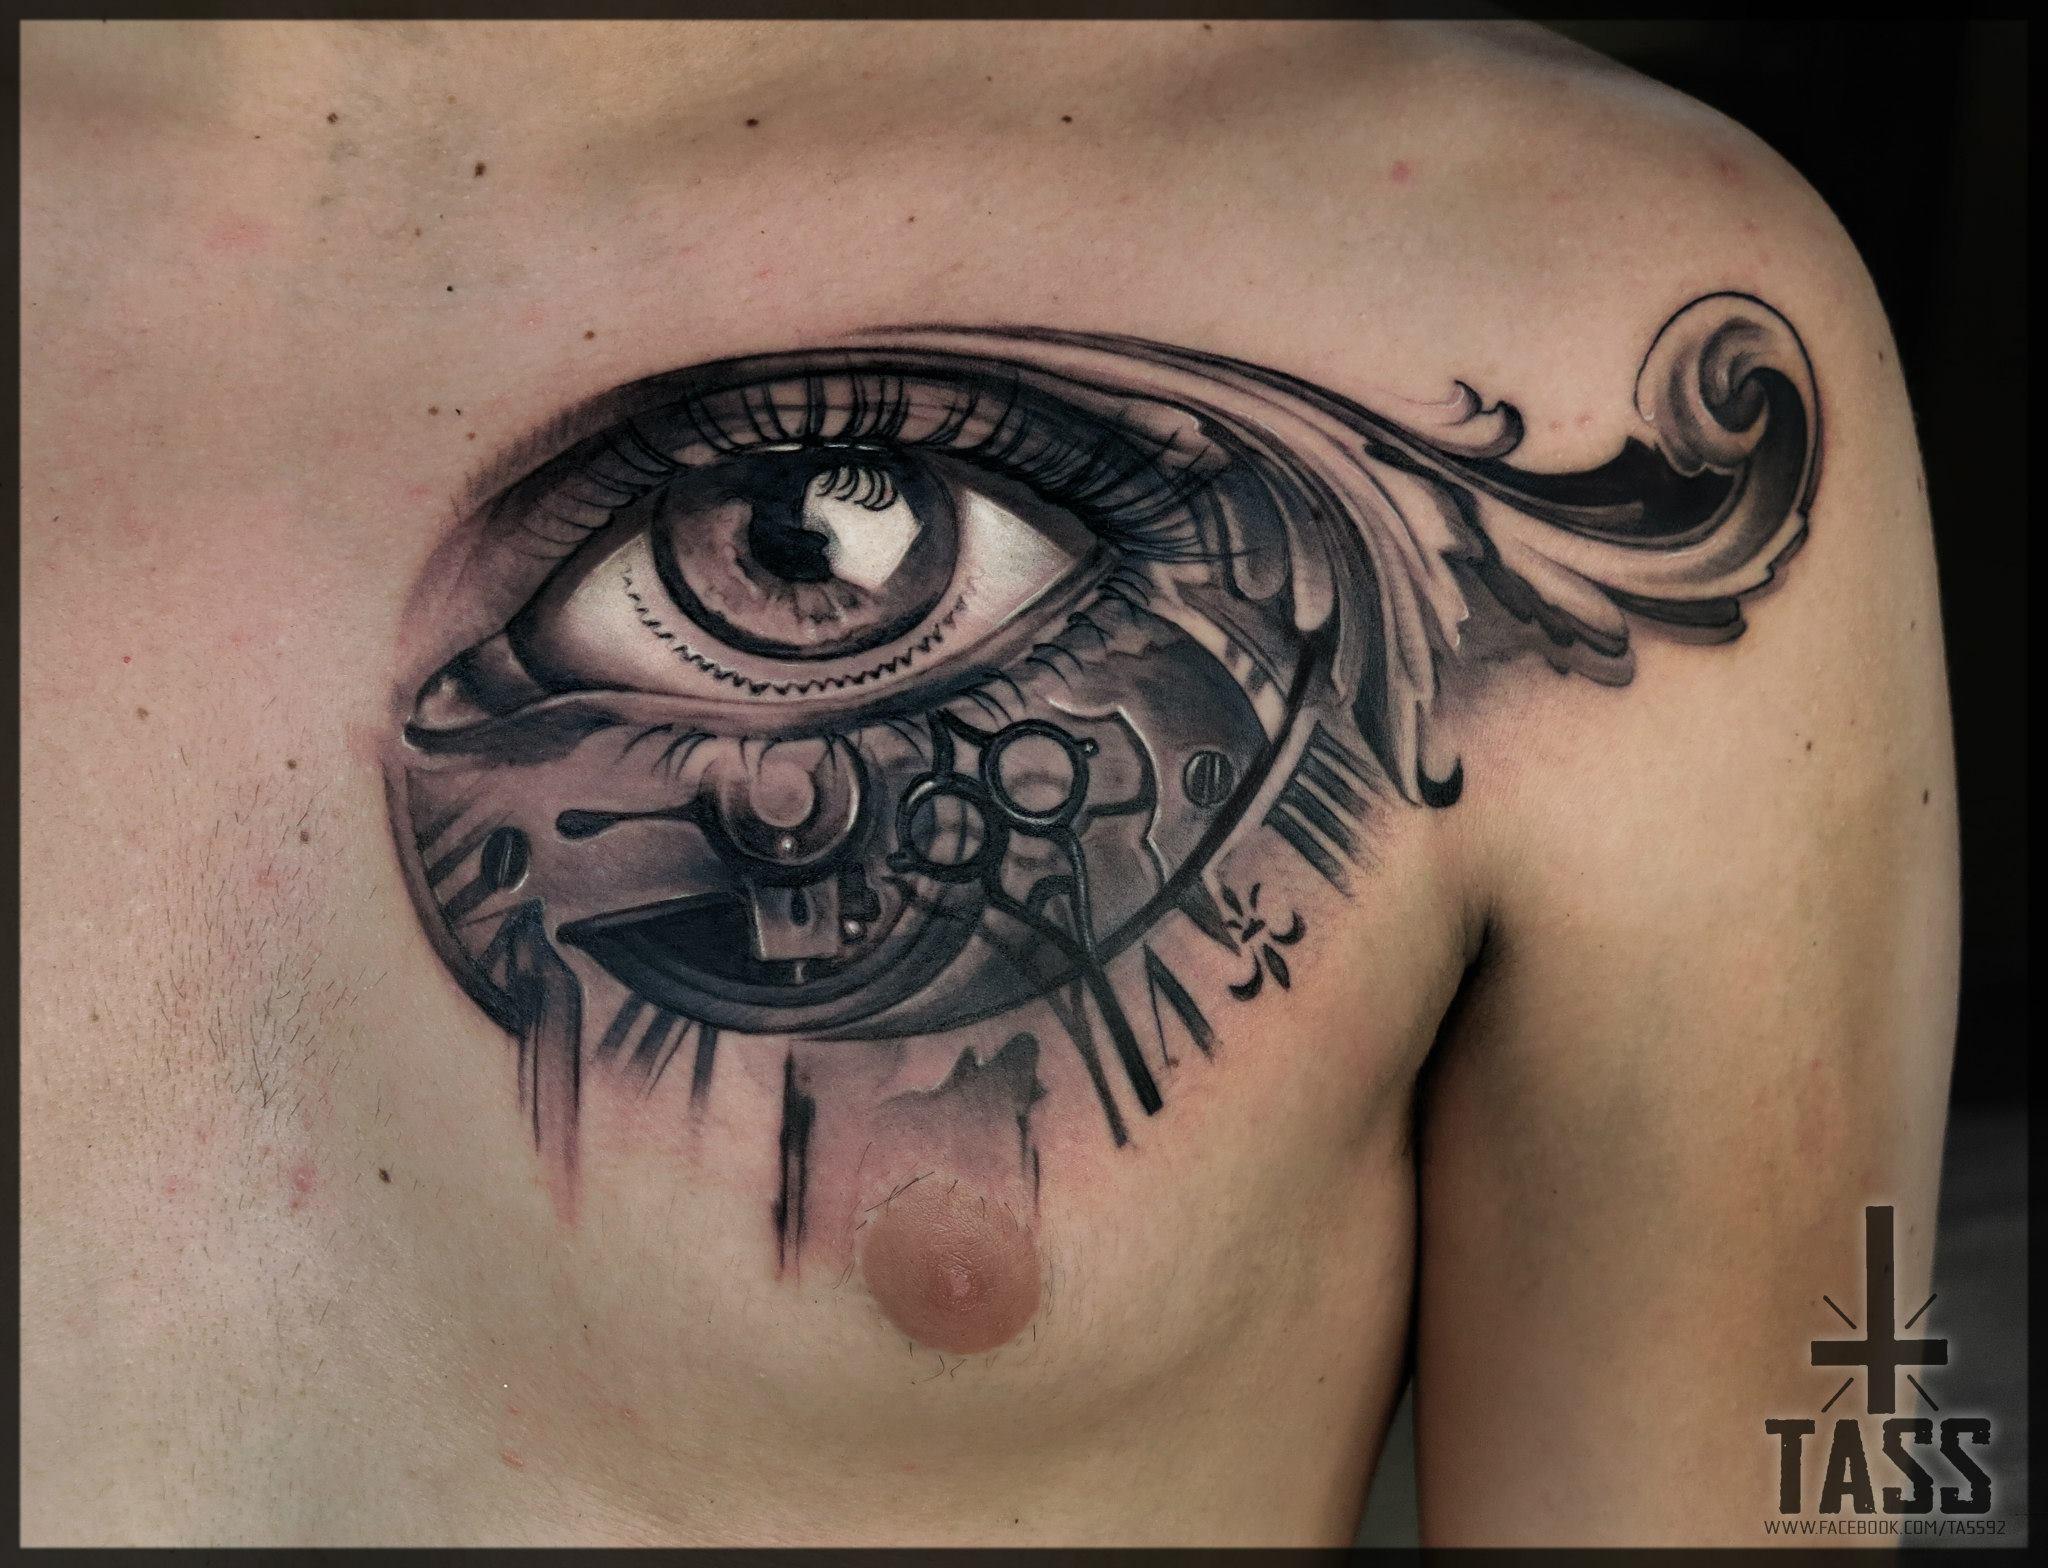 Tass au cantal in k the skin actualit s festival du tatouage - Oeil d horus tatouage ...